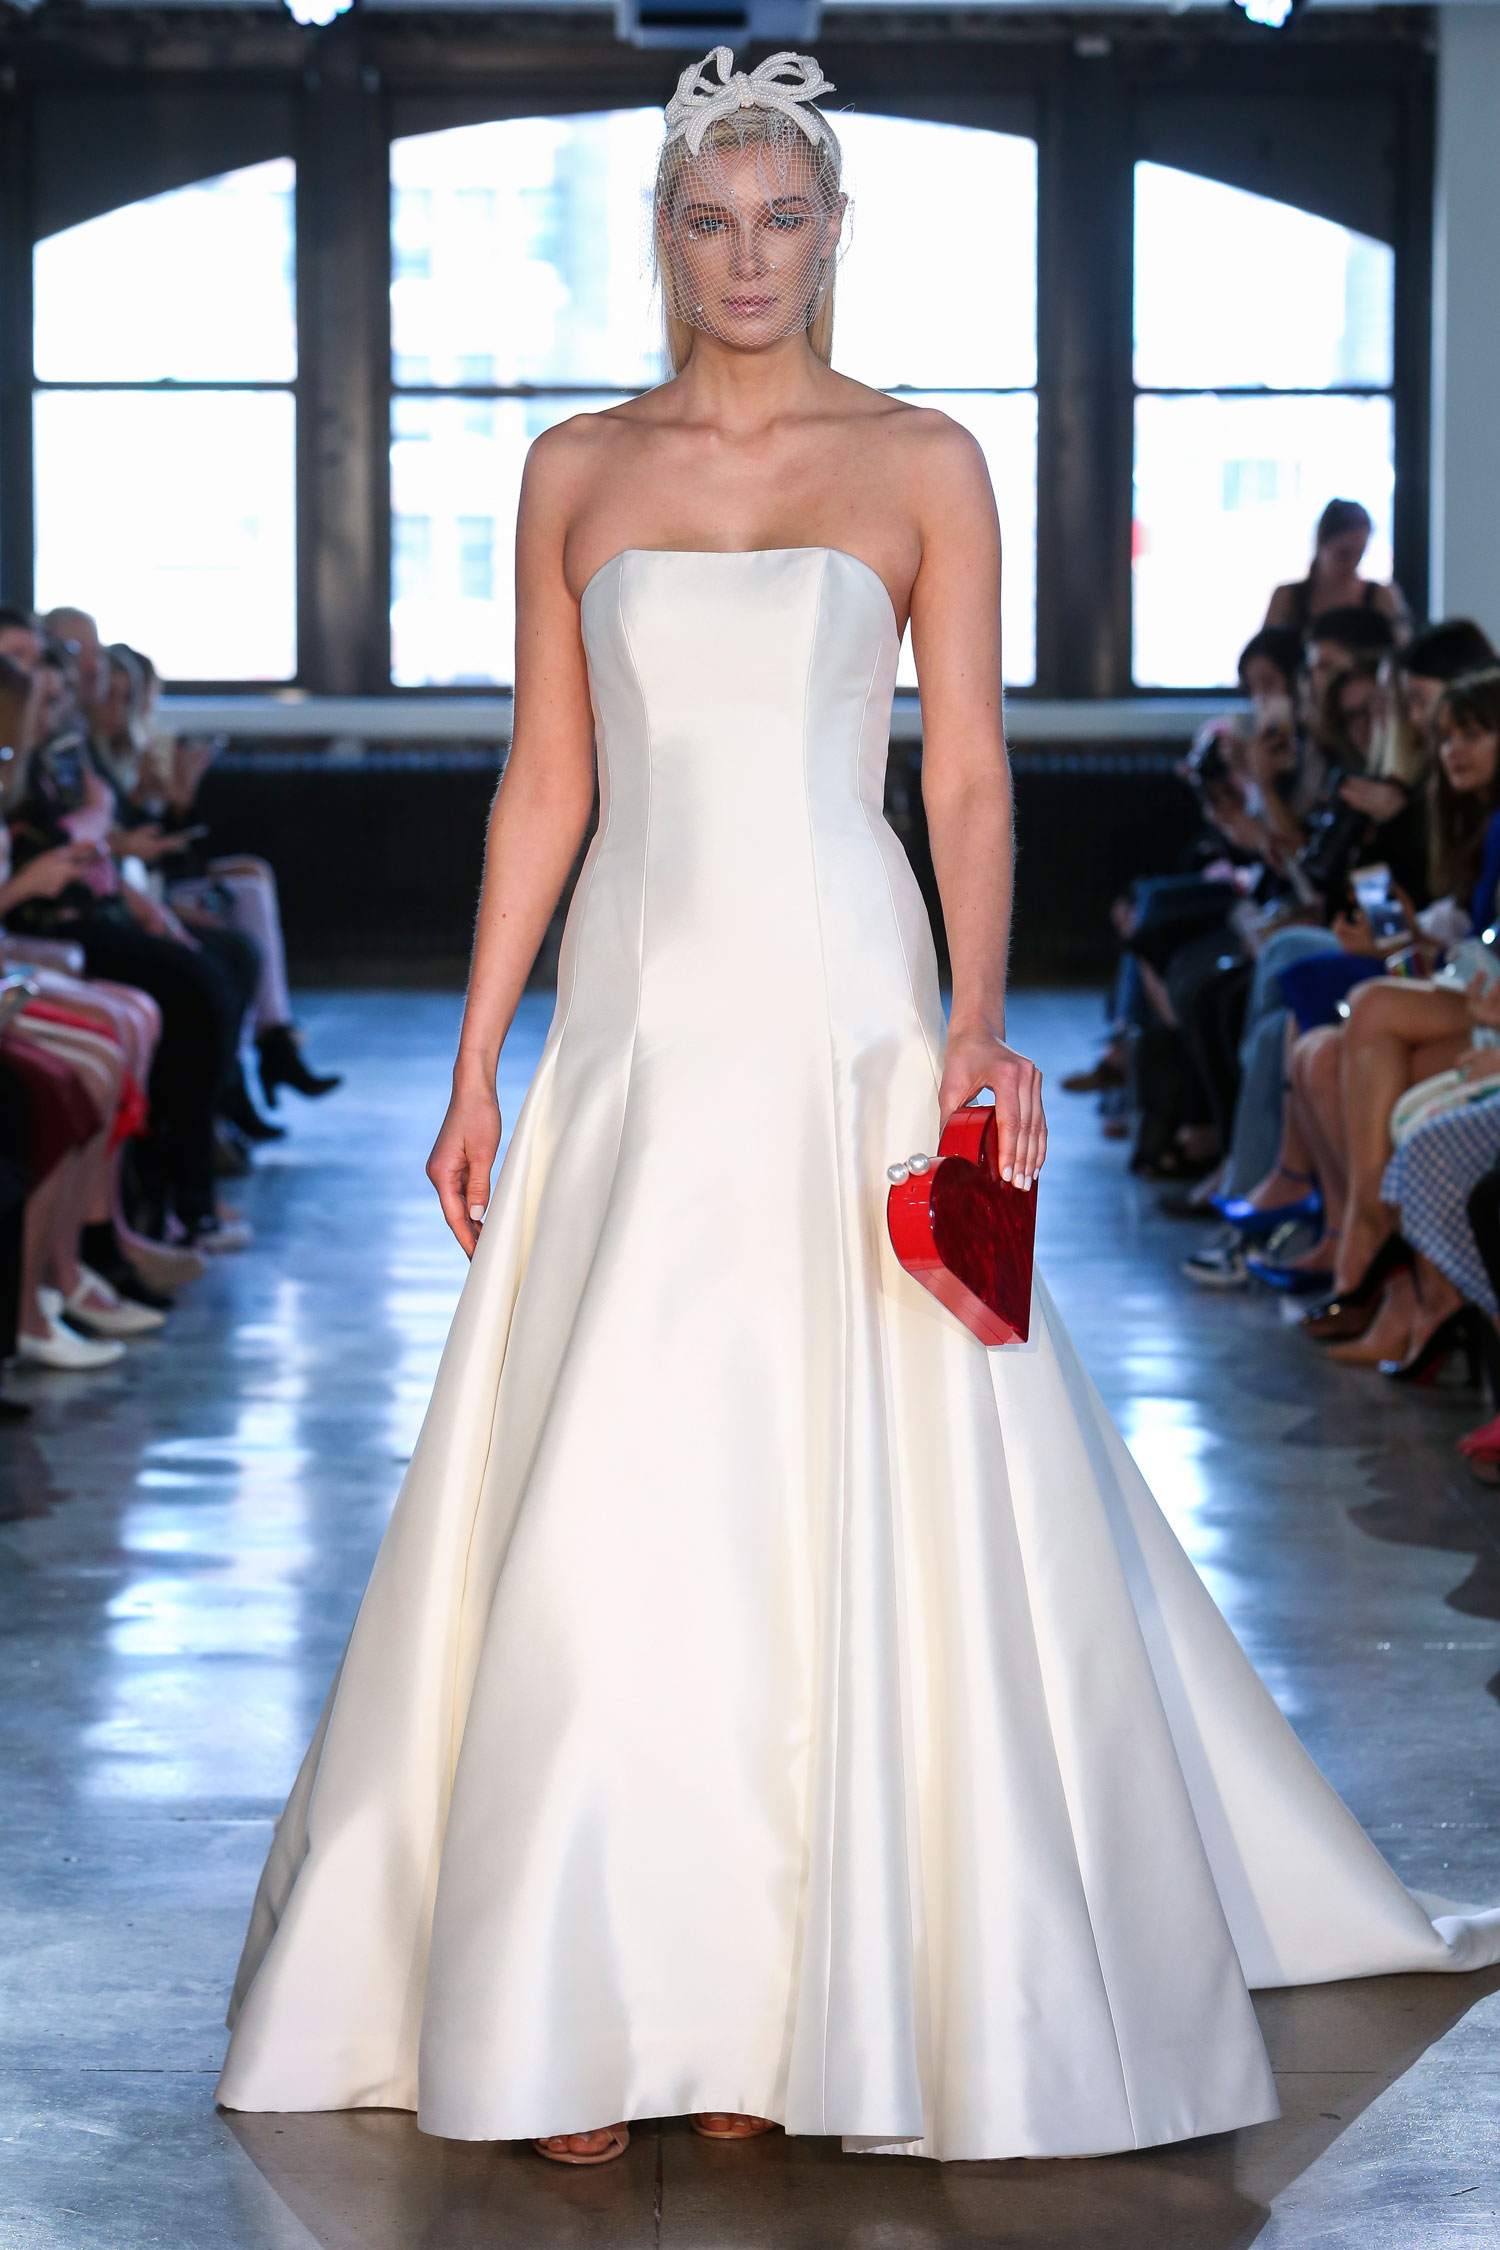 Watters strapless ball gown silk fabric minimalist design meghan markle wedding inspiration